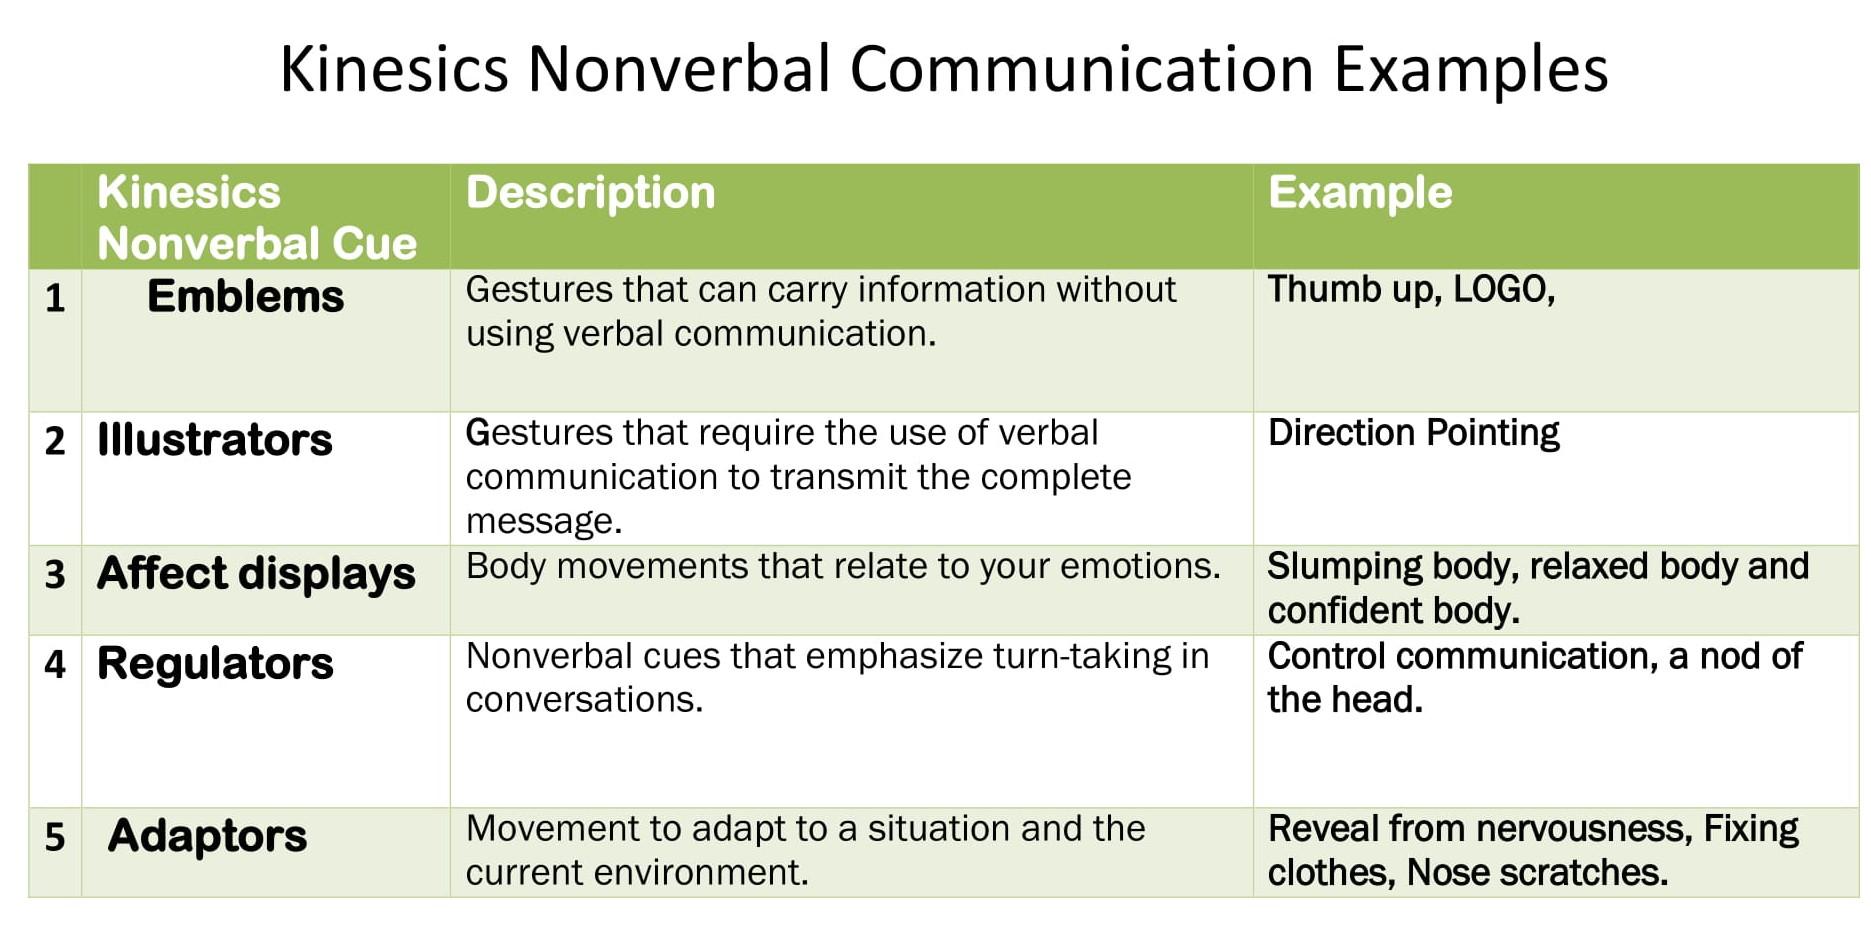 Nonverbal Communication Example - Kinesics Types of Nonverbal Communication